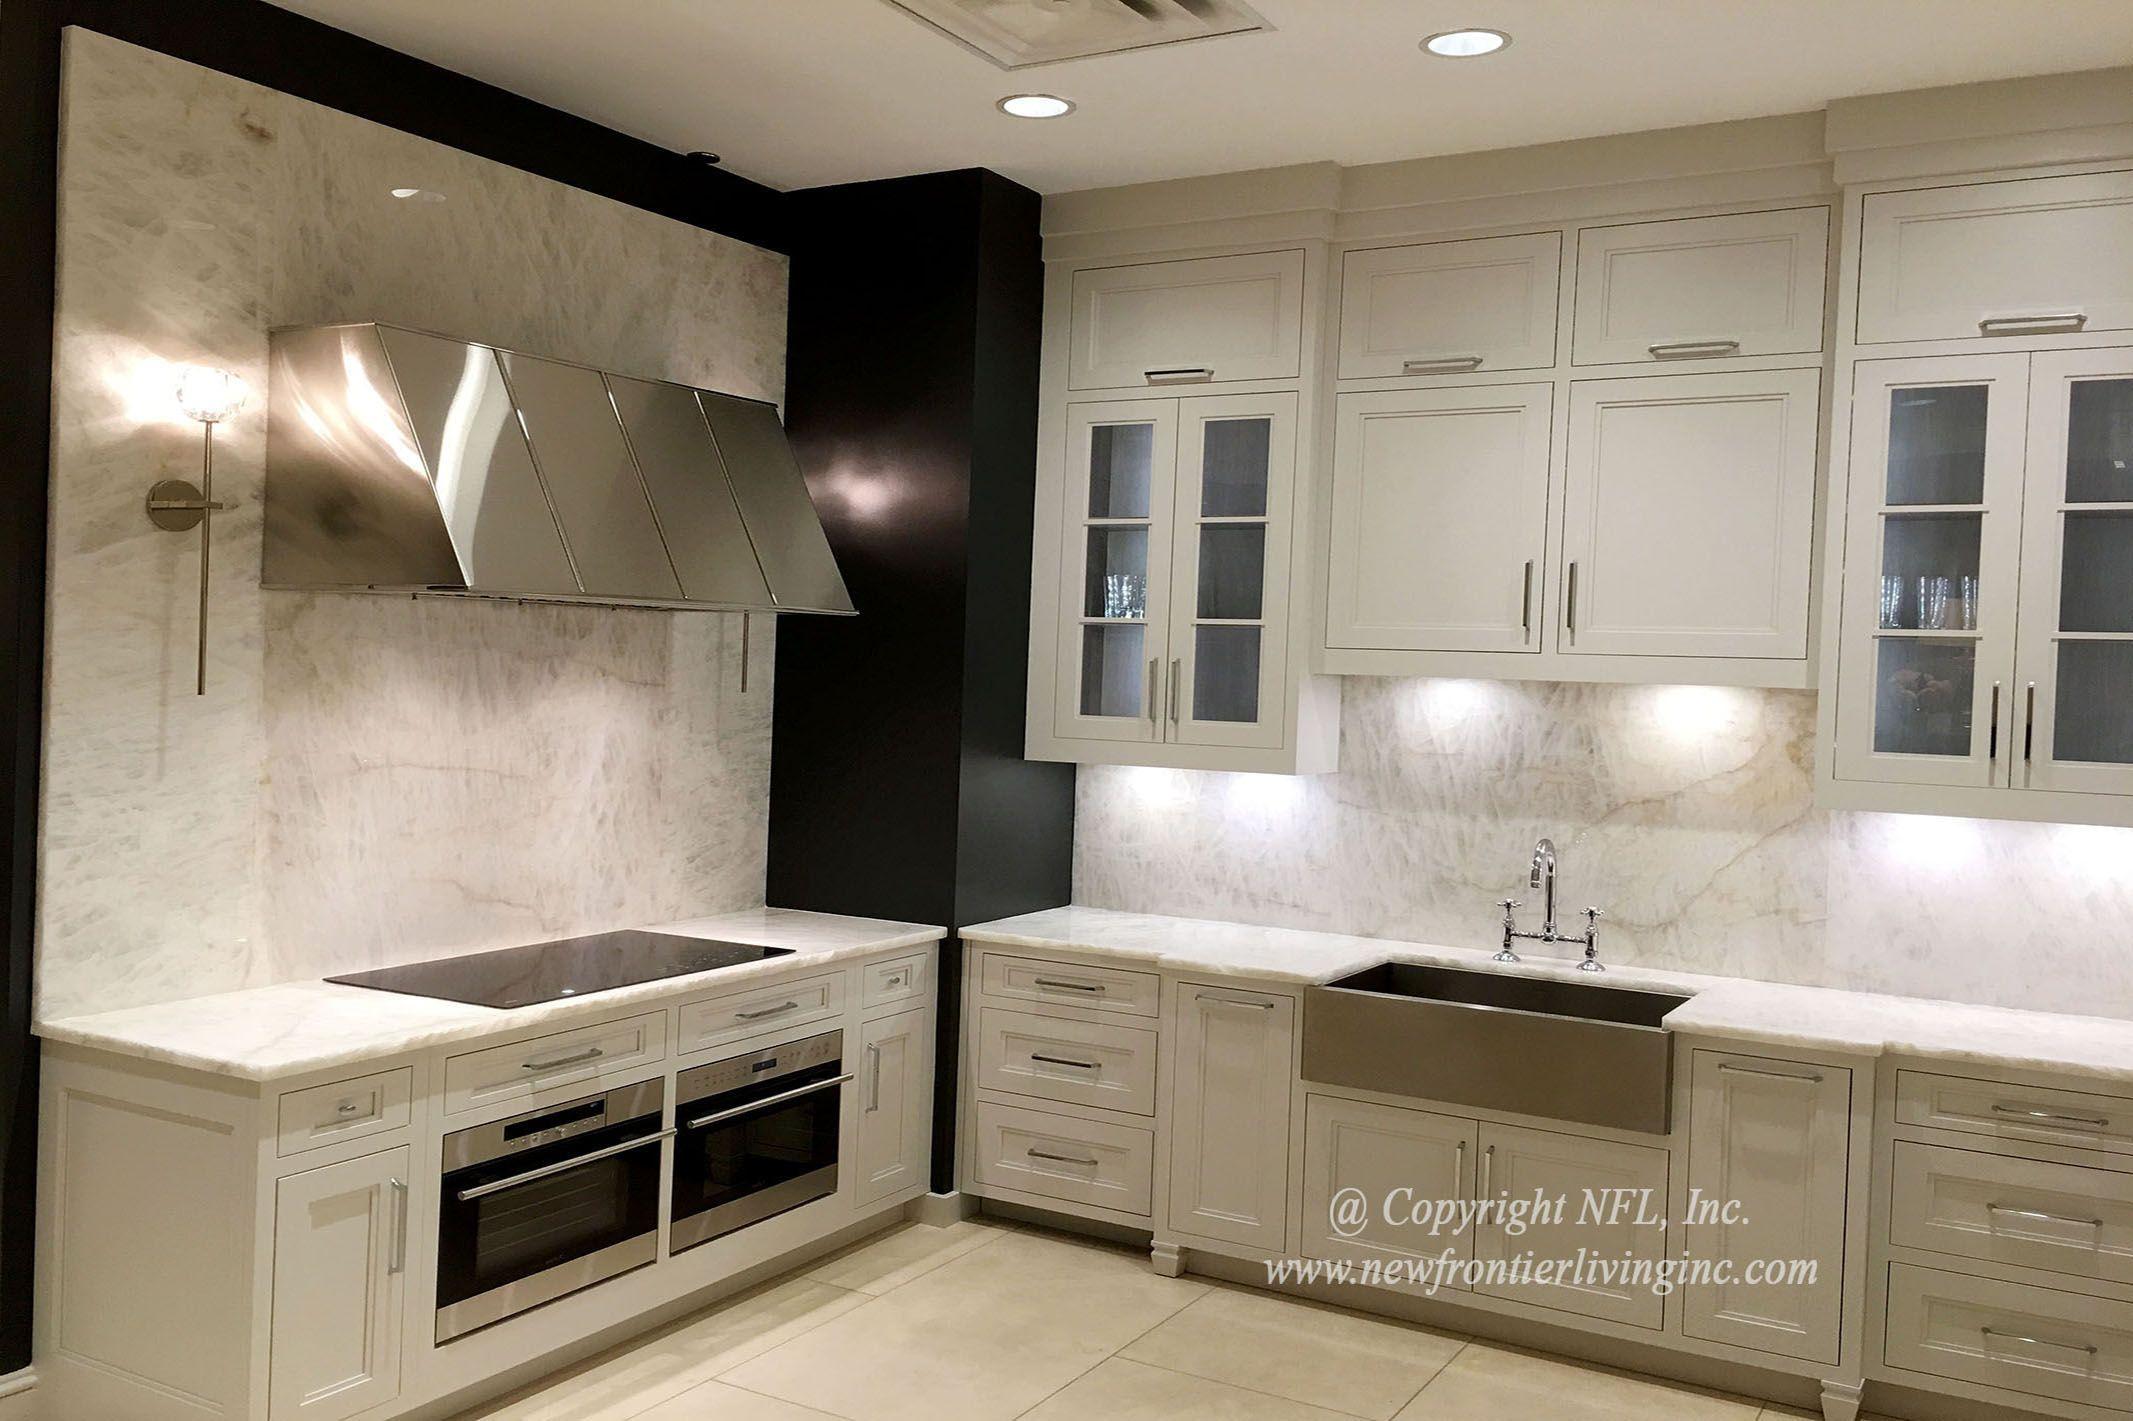 Plain Fancy Kitchen Cabinetry Chicago Il 2016 Newfrontierlivinginc Kitchen Remodeling Kitchendesi Fancy Kitchens Kitchen Design Kitchen Cabinetry